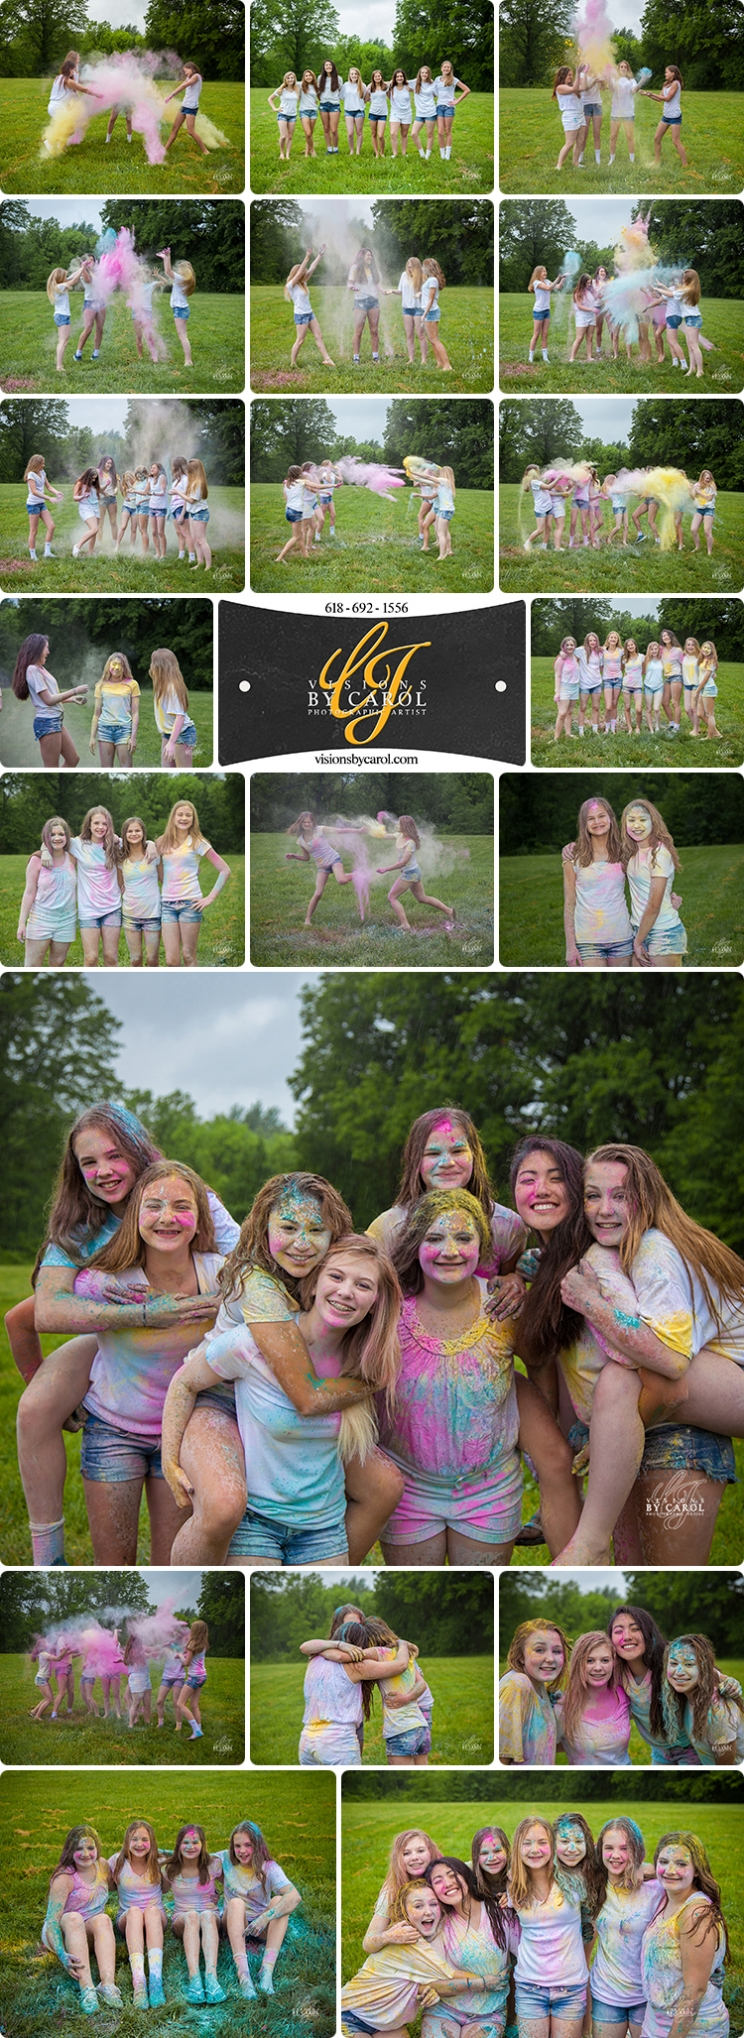 Powder Girls